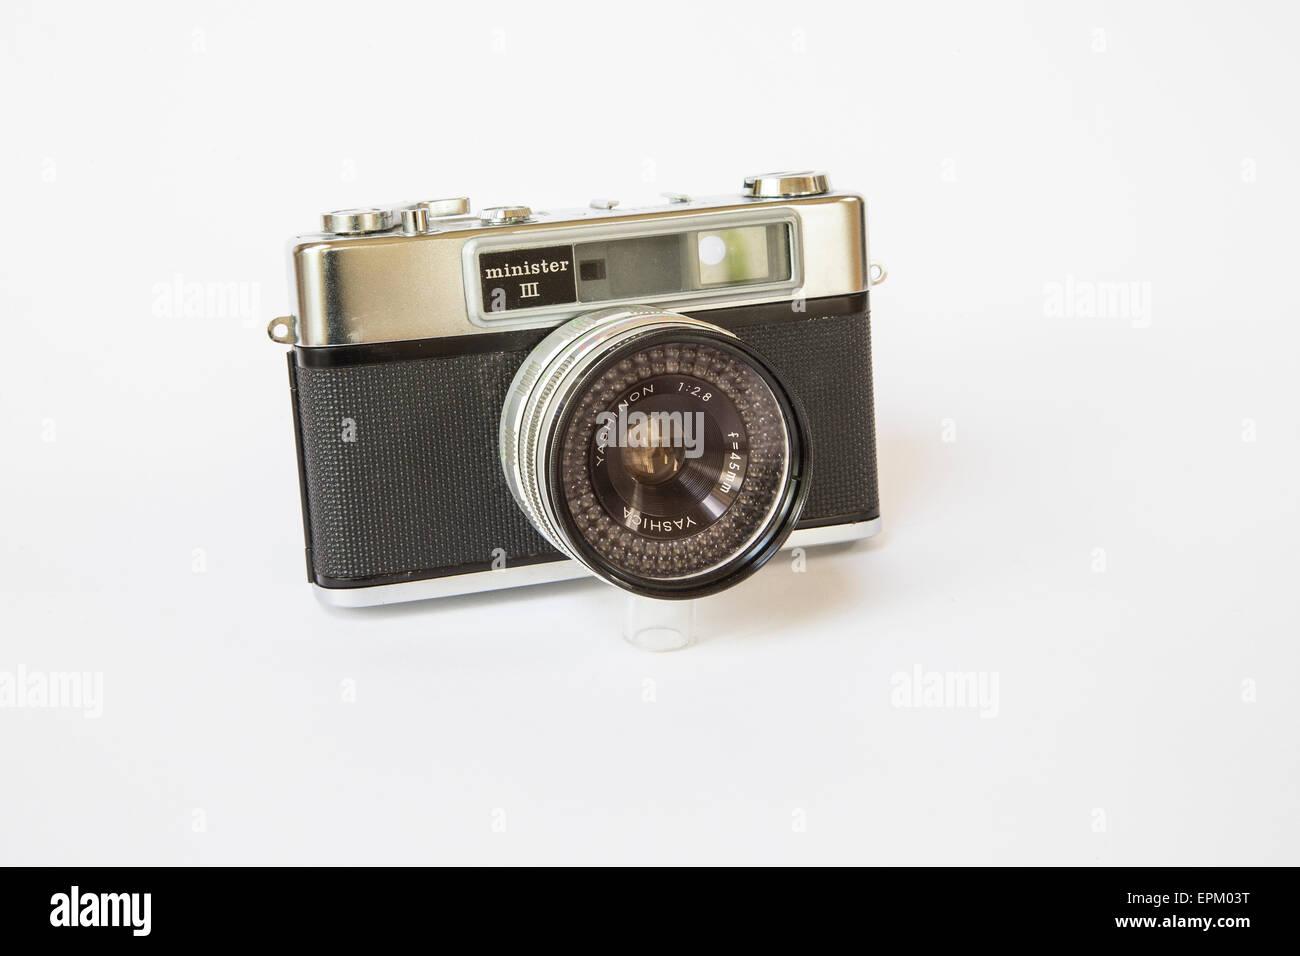 Yashica minister iii entfernungsmesser 35mm kamera ca. 1970 mit